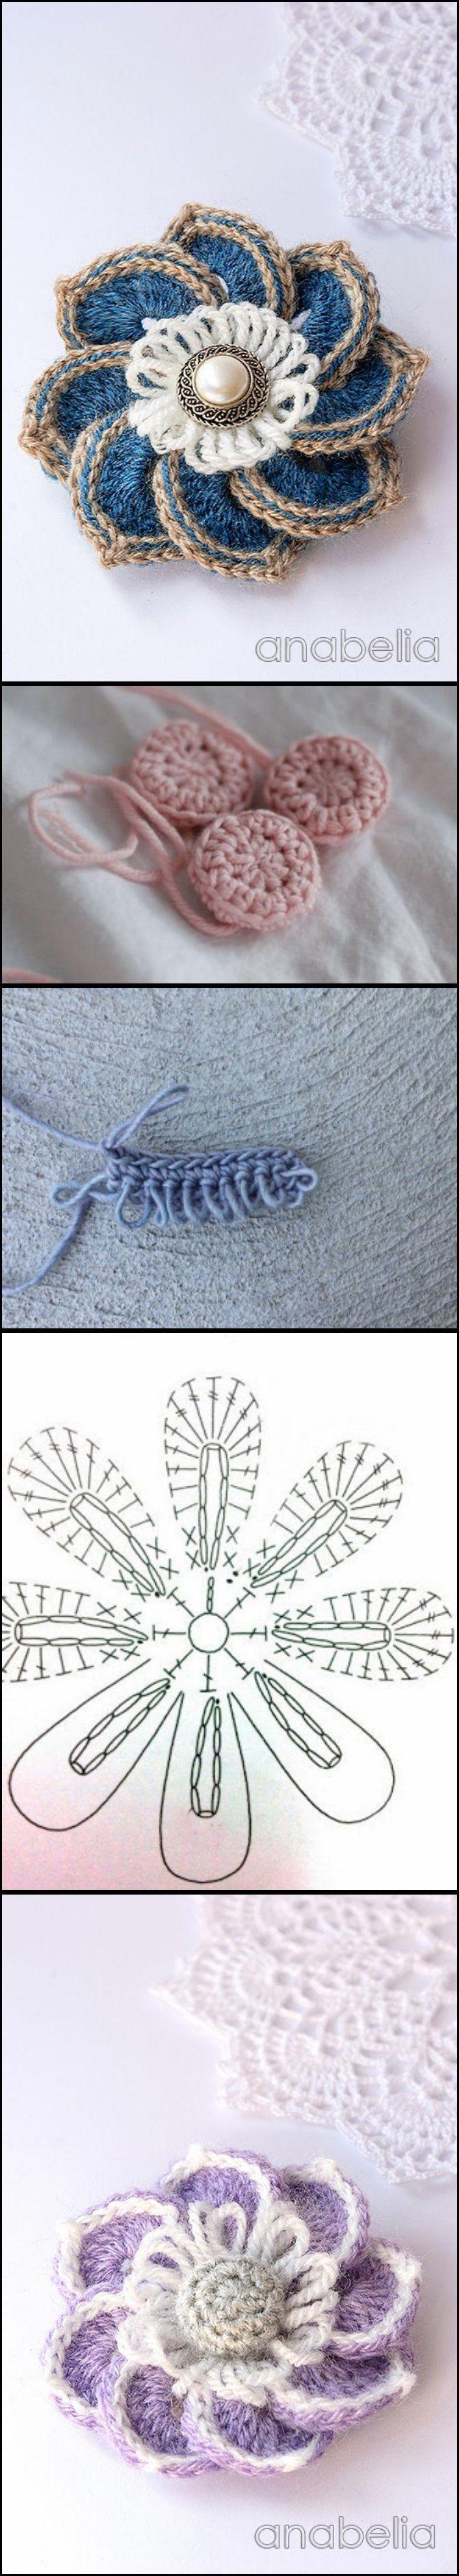 Crochet Brooches, Chart and Tutorials